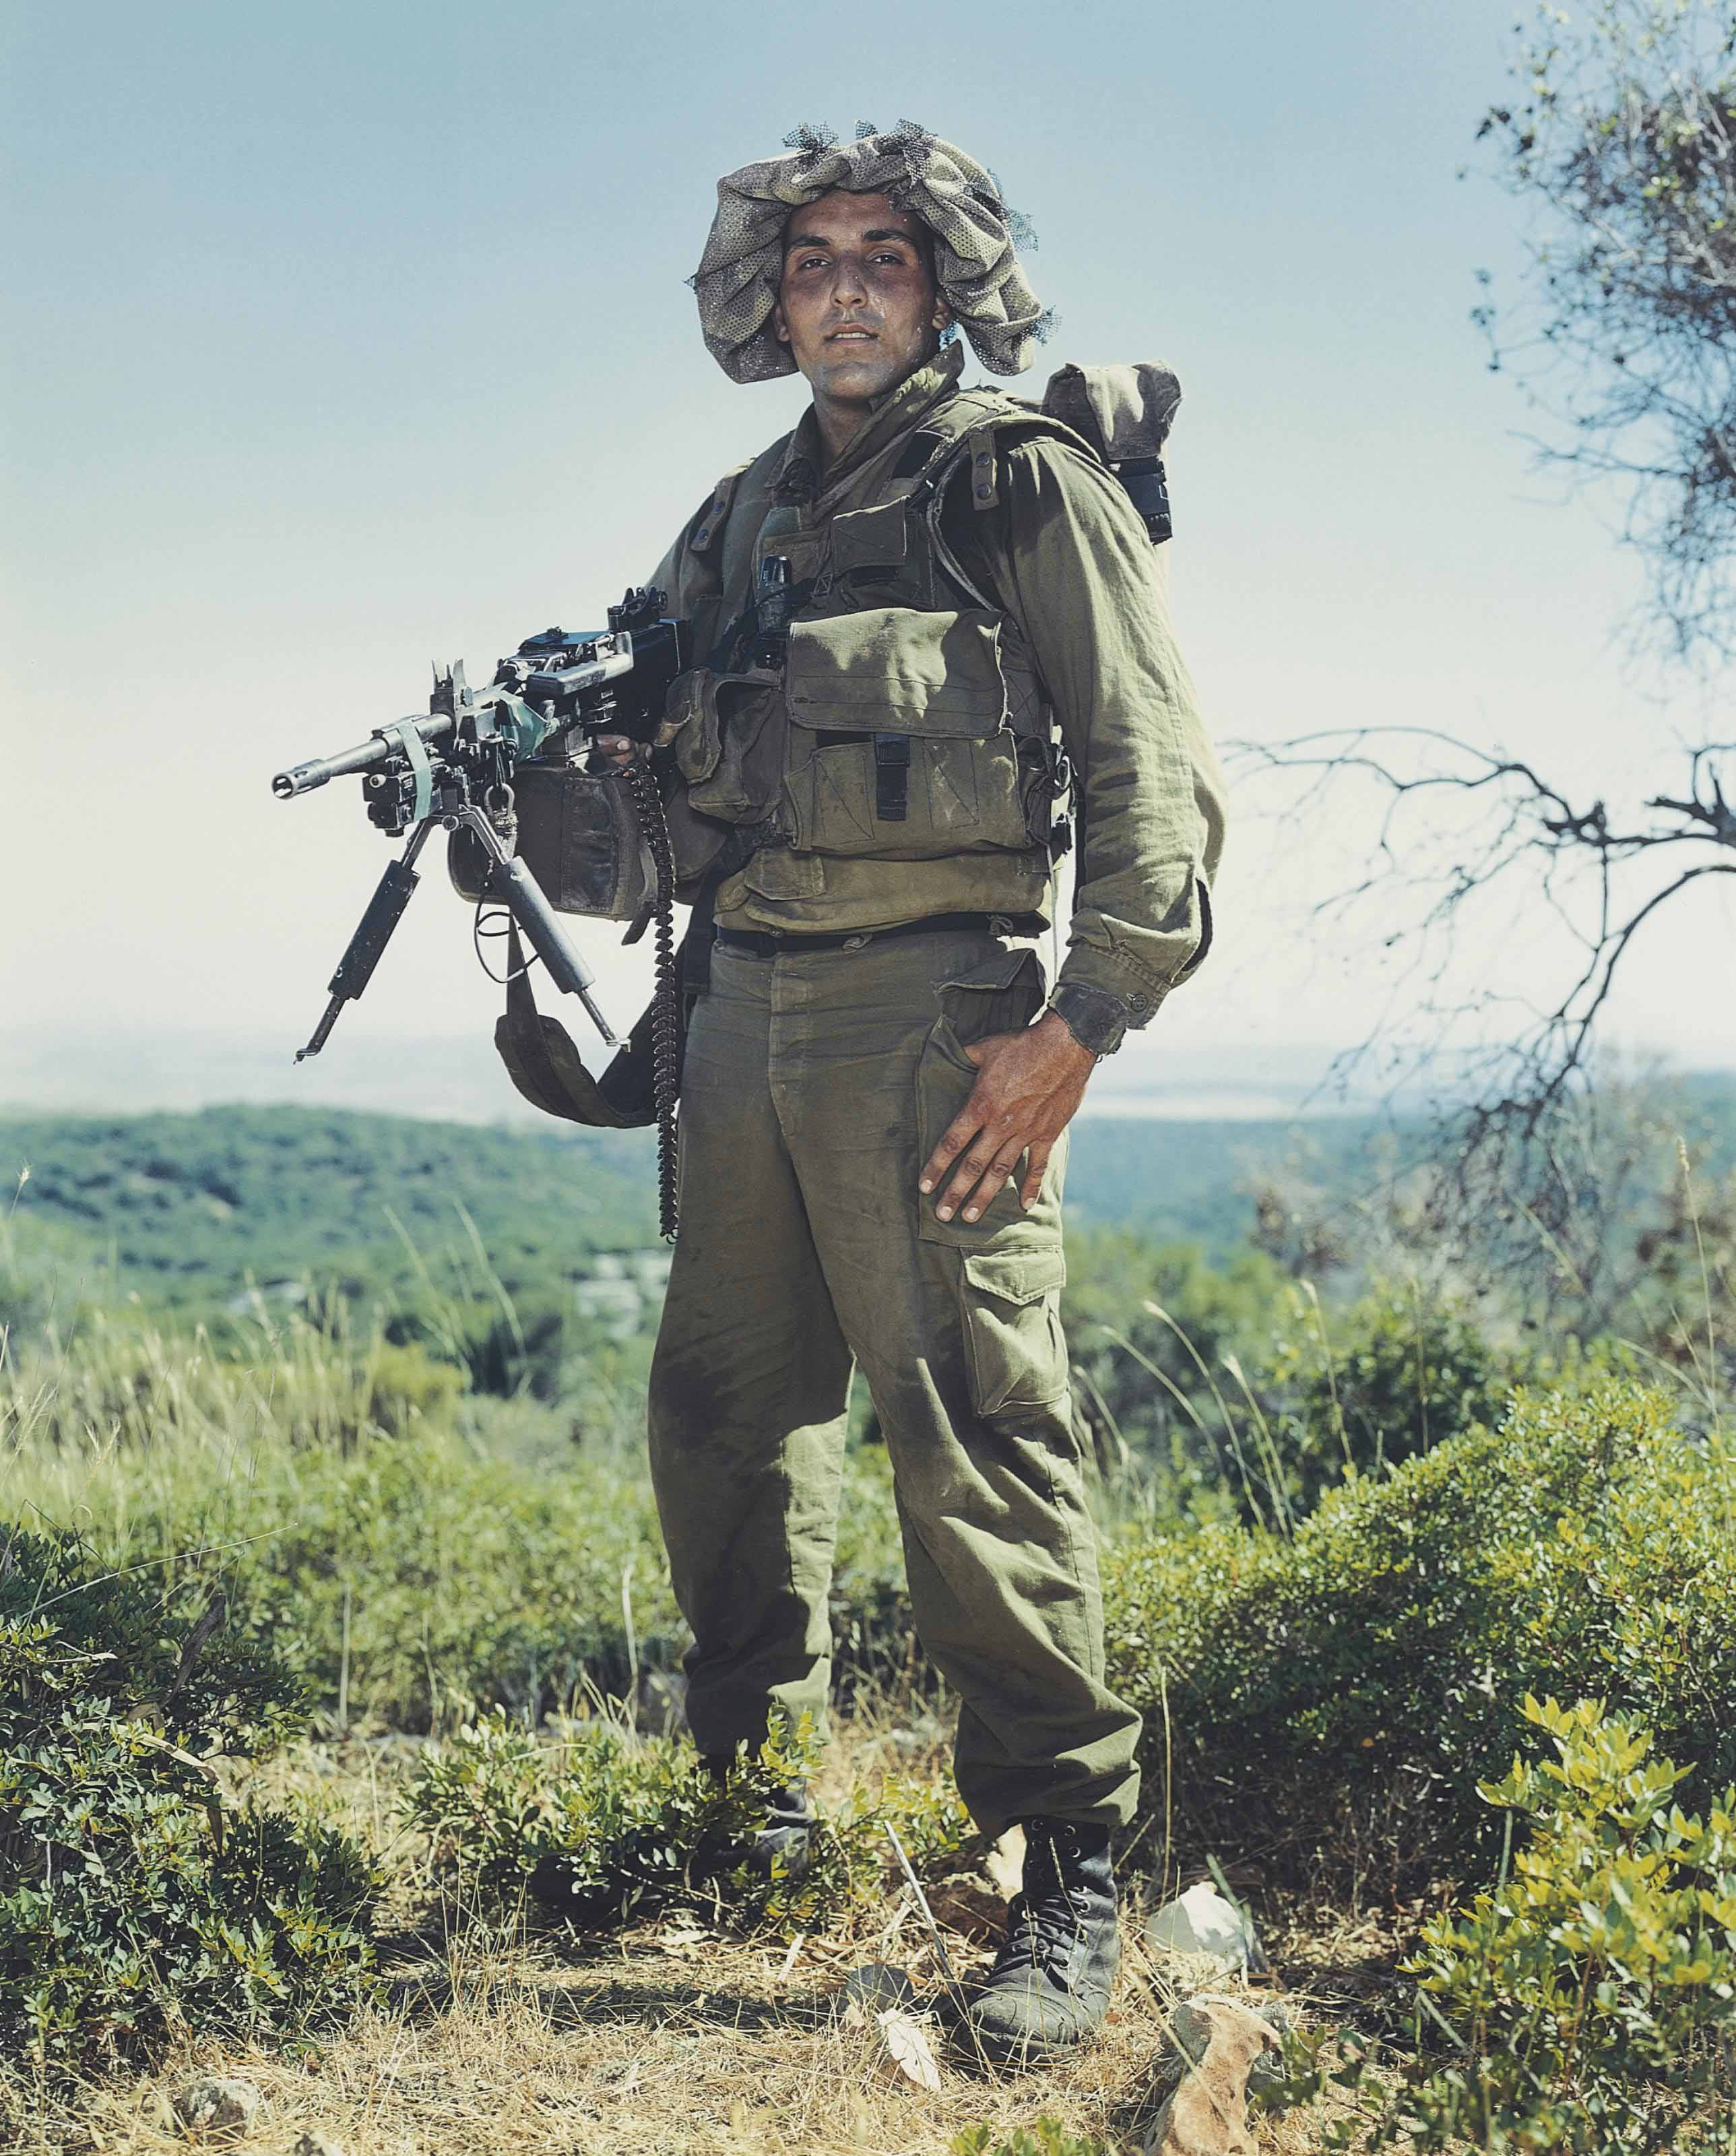 Erez, Golani Brigade, Elyacim, Israel, May 26, 1999